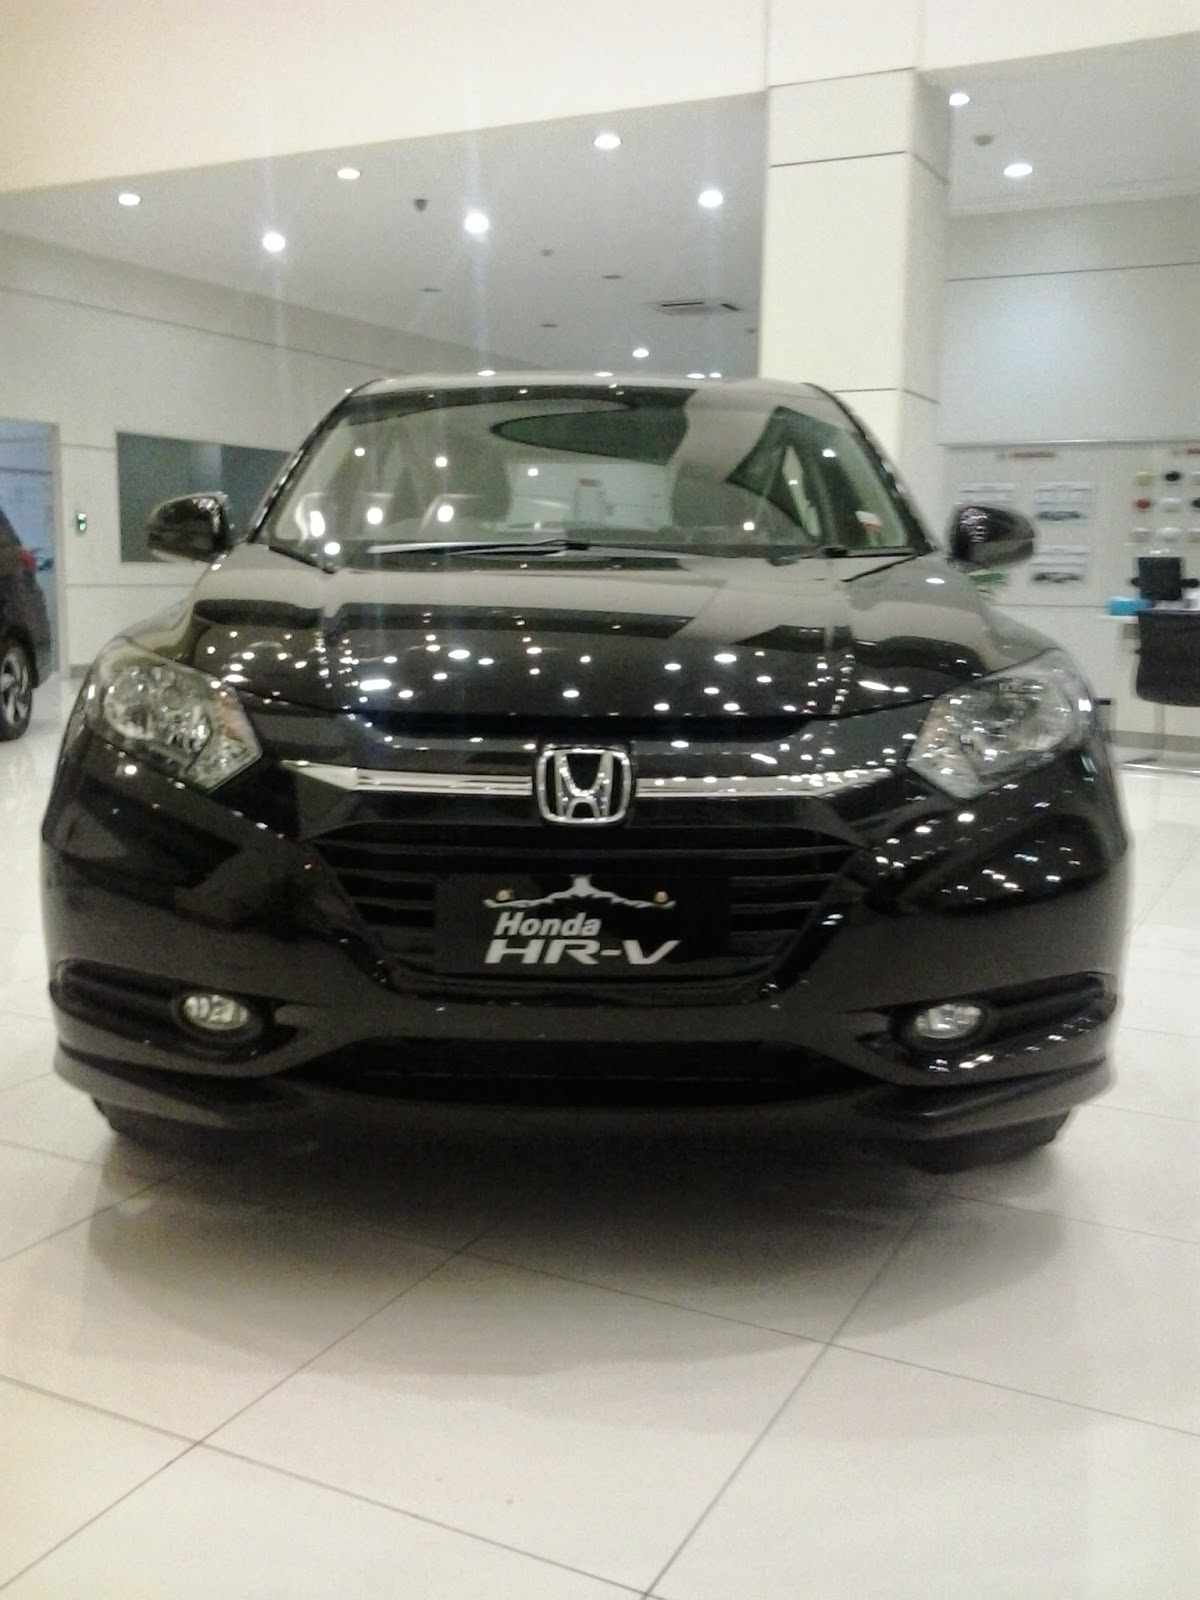 Honda HRV Crytsal Black Pearl